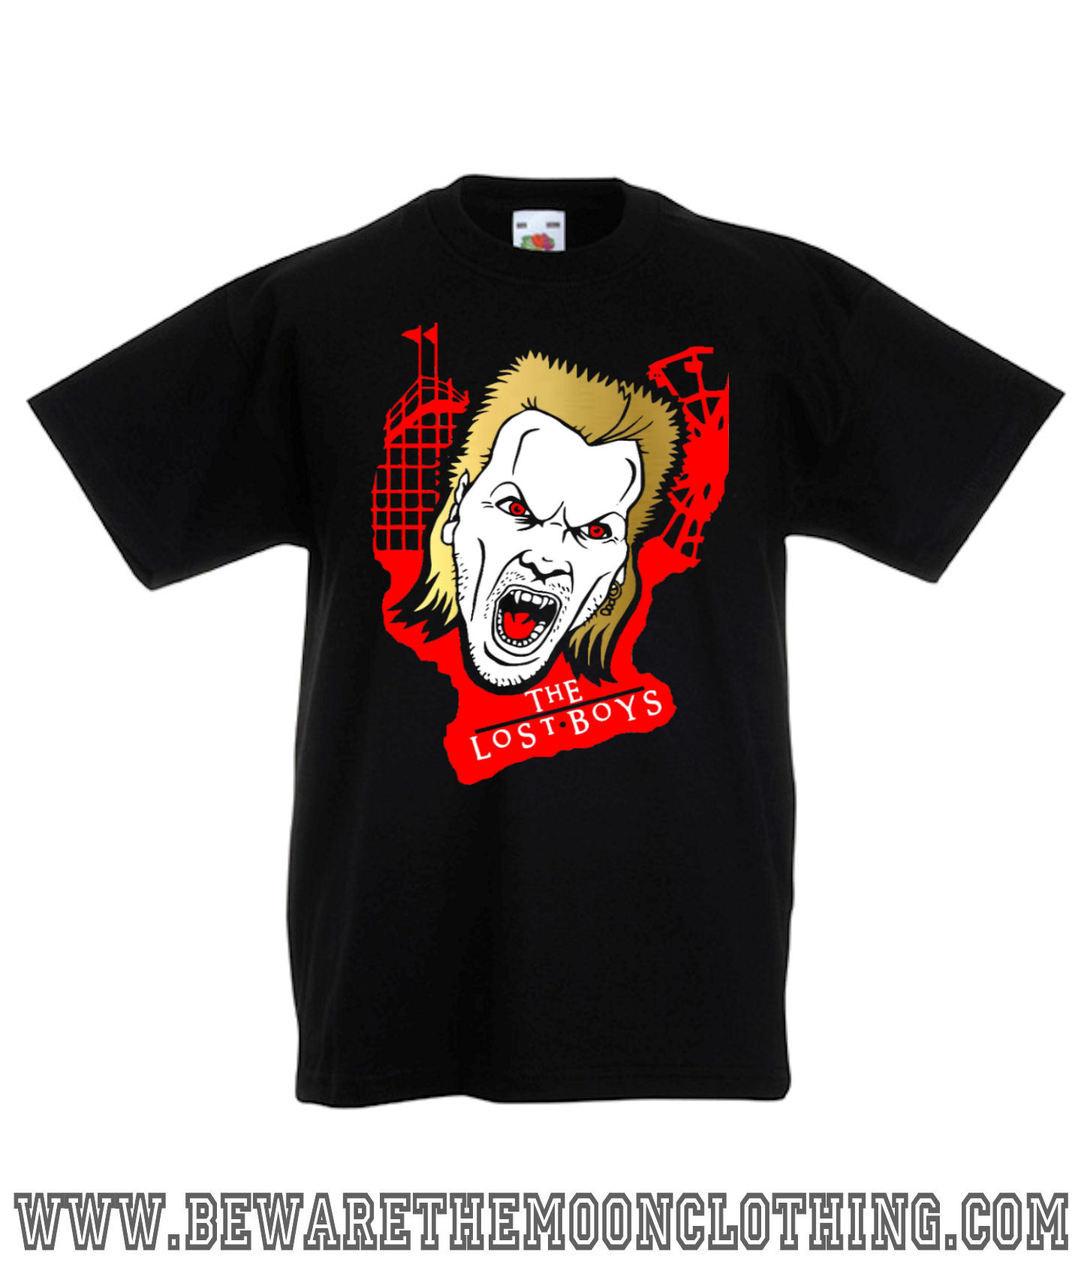 The Lost Boys 80s Vampire Horror Movie T Shirt